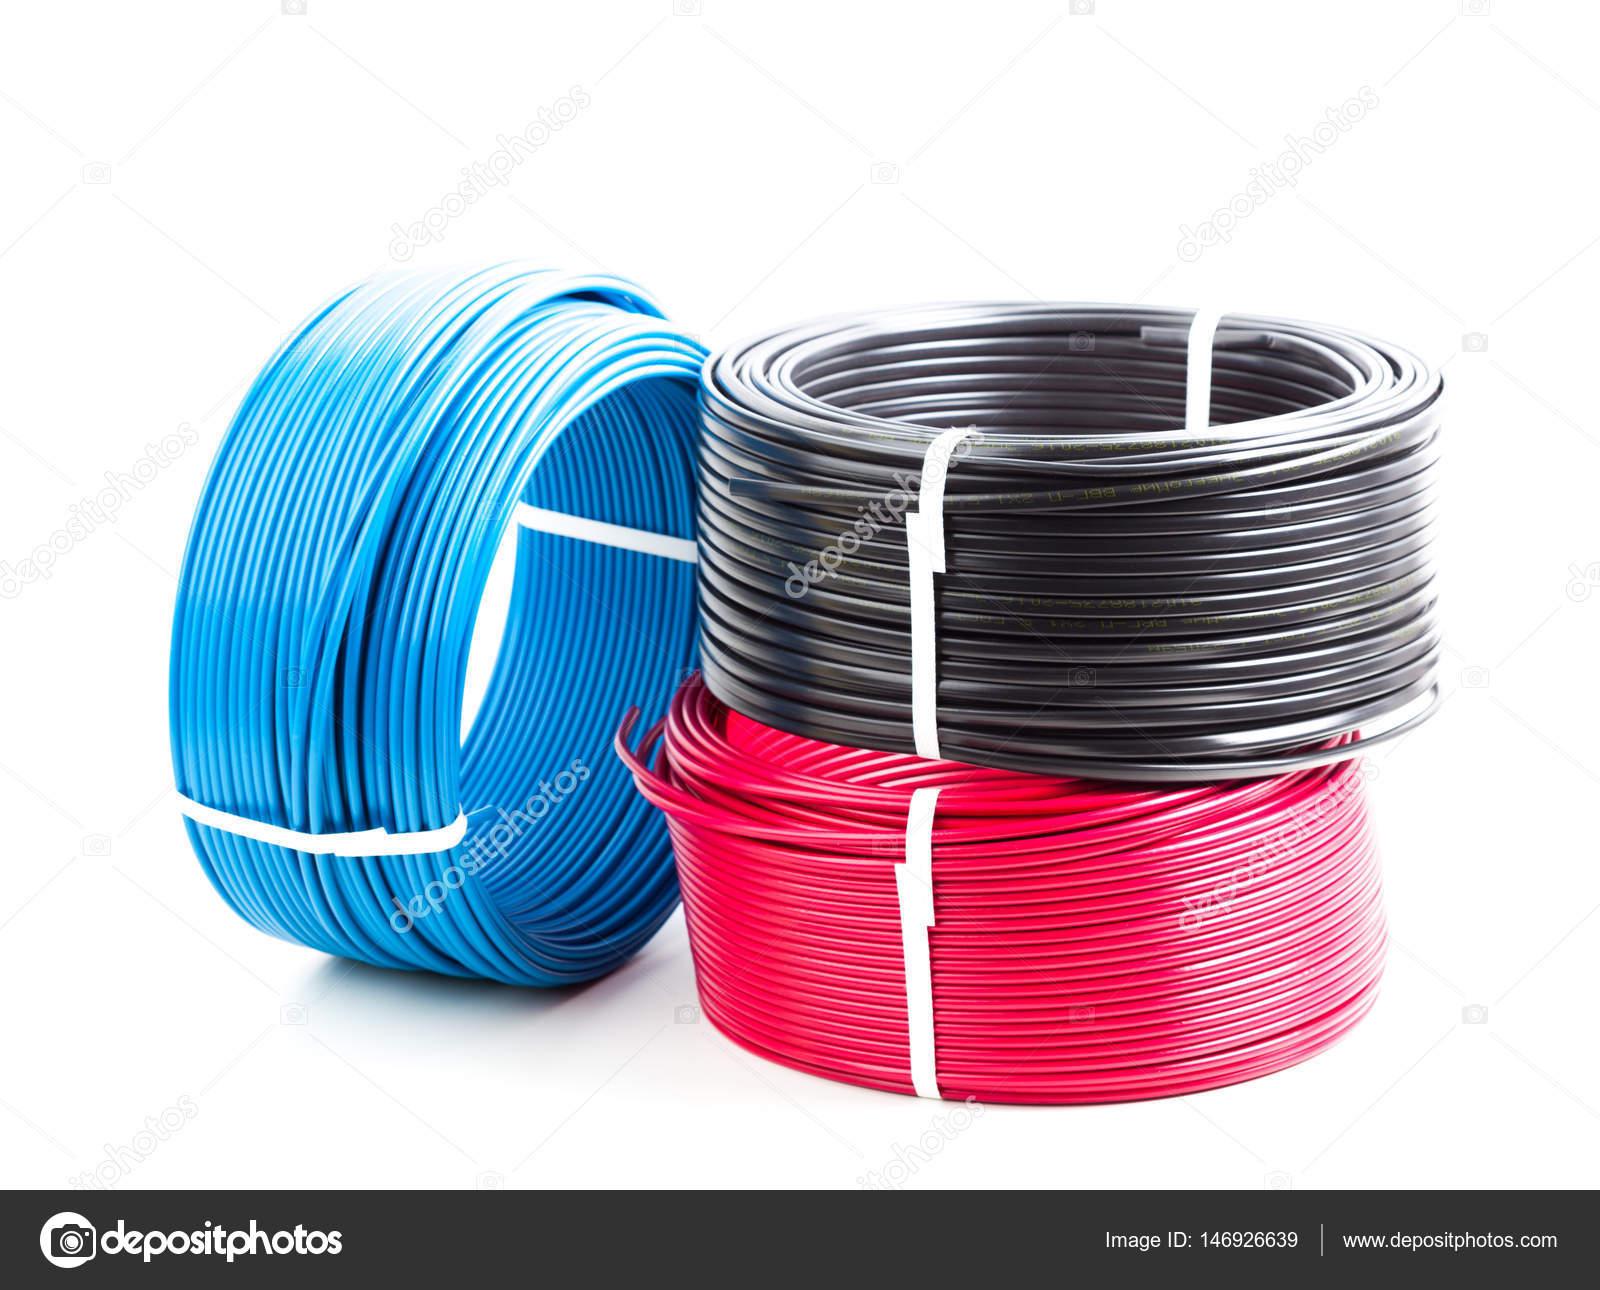 Farbige Elektrokabel farbige kabel stockfoto fotofabrika 146926639